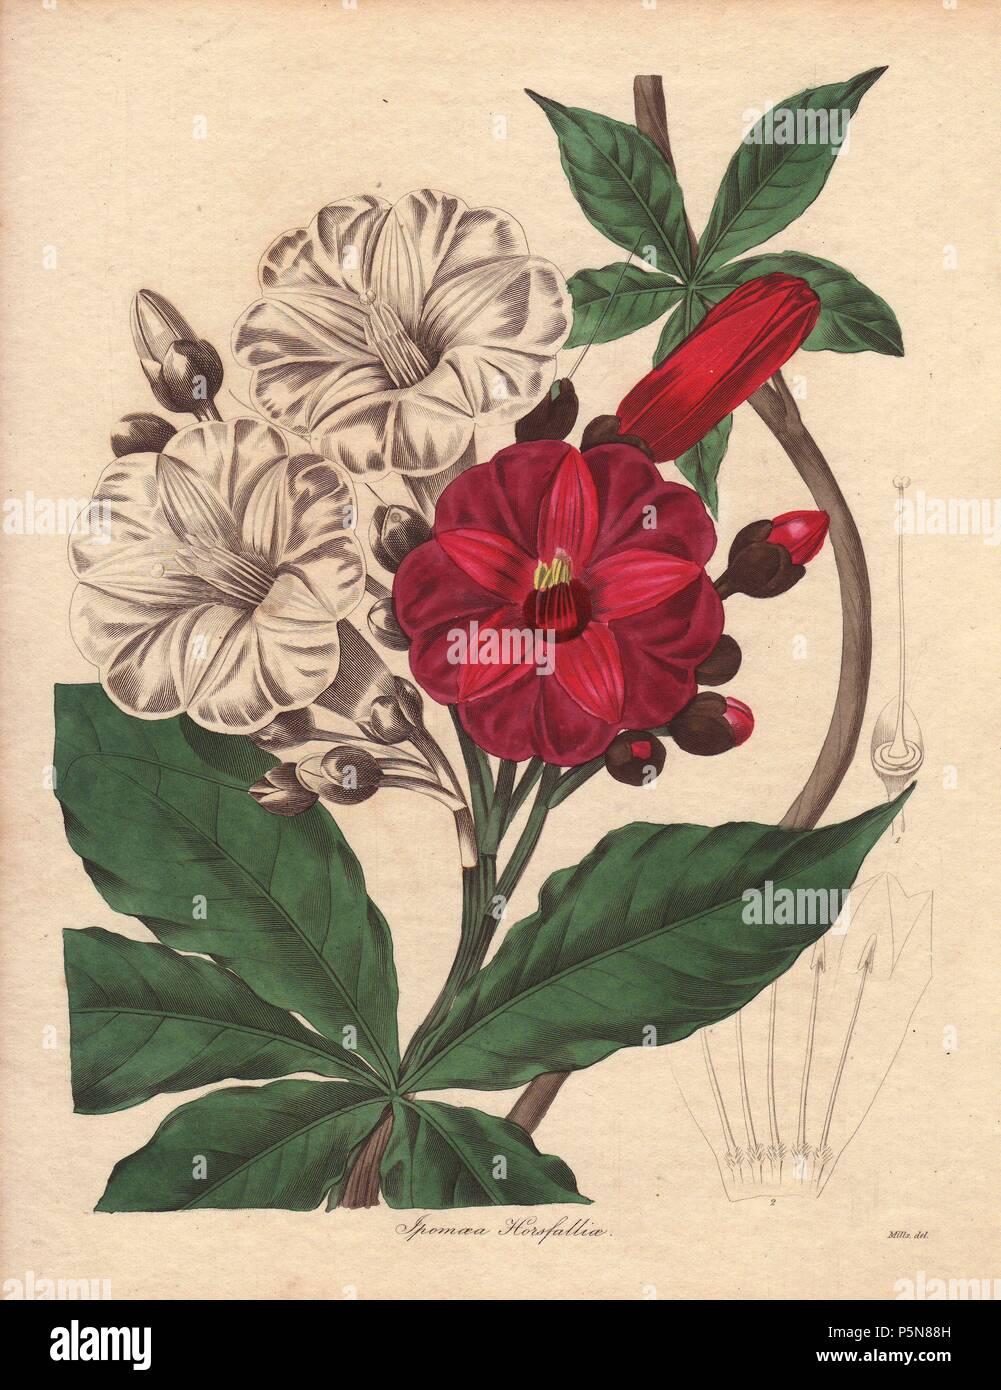 Female Flower With Ovary Stock Photos Female Flower With Ovary